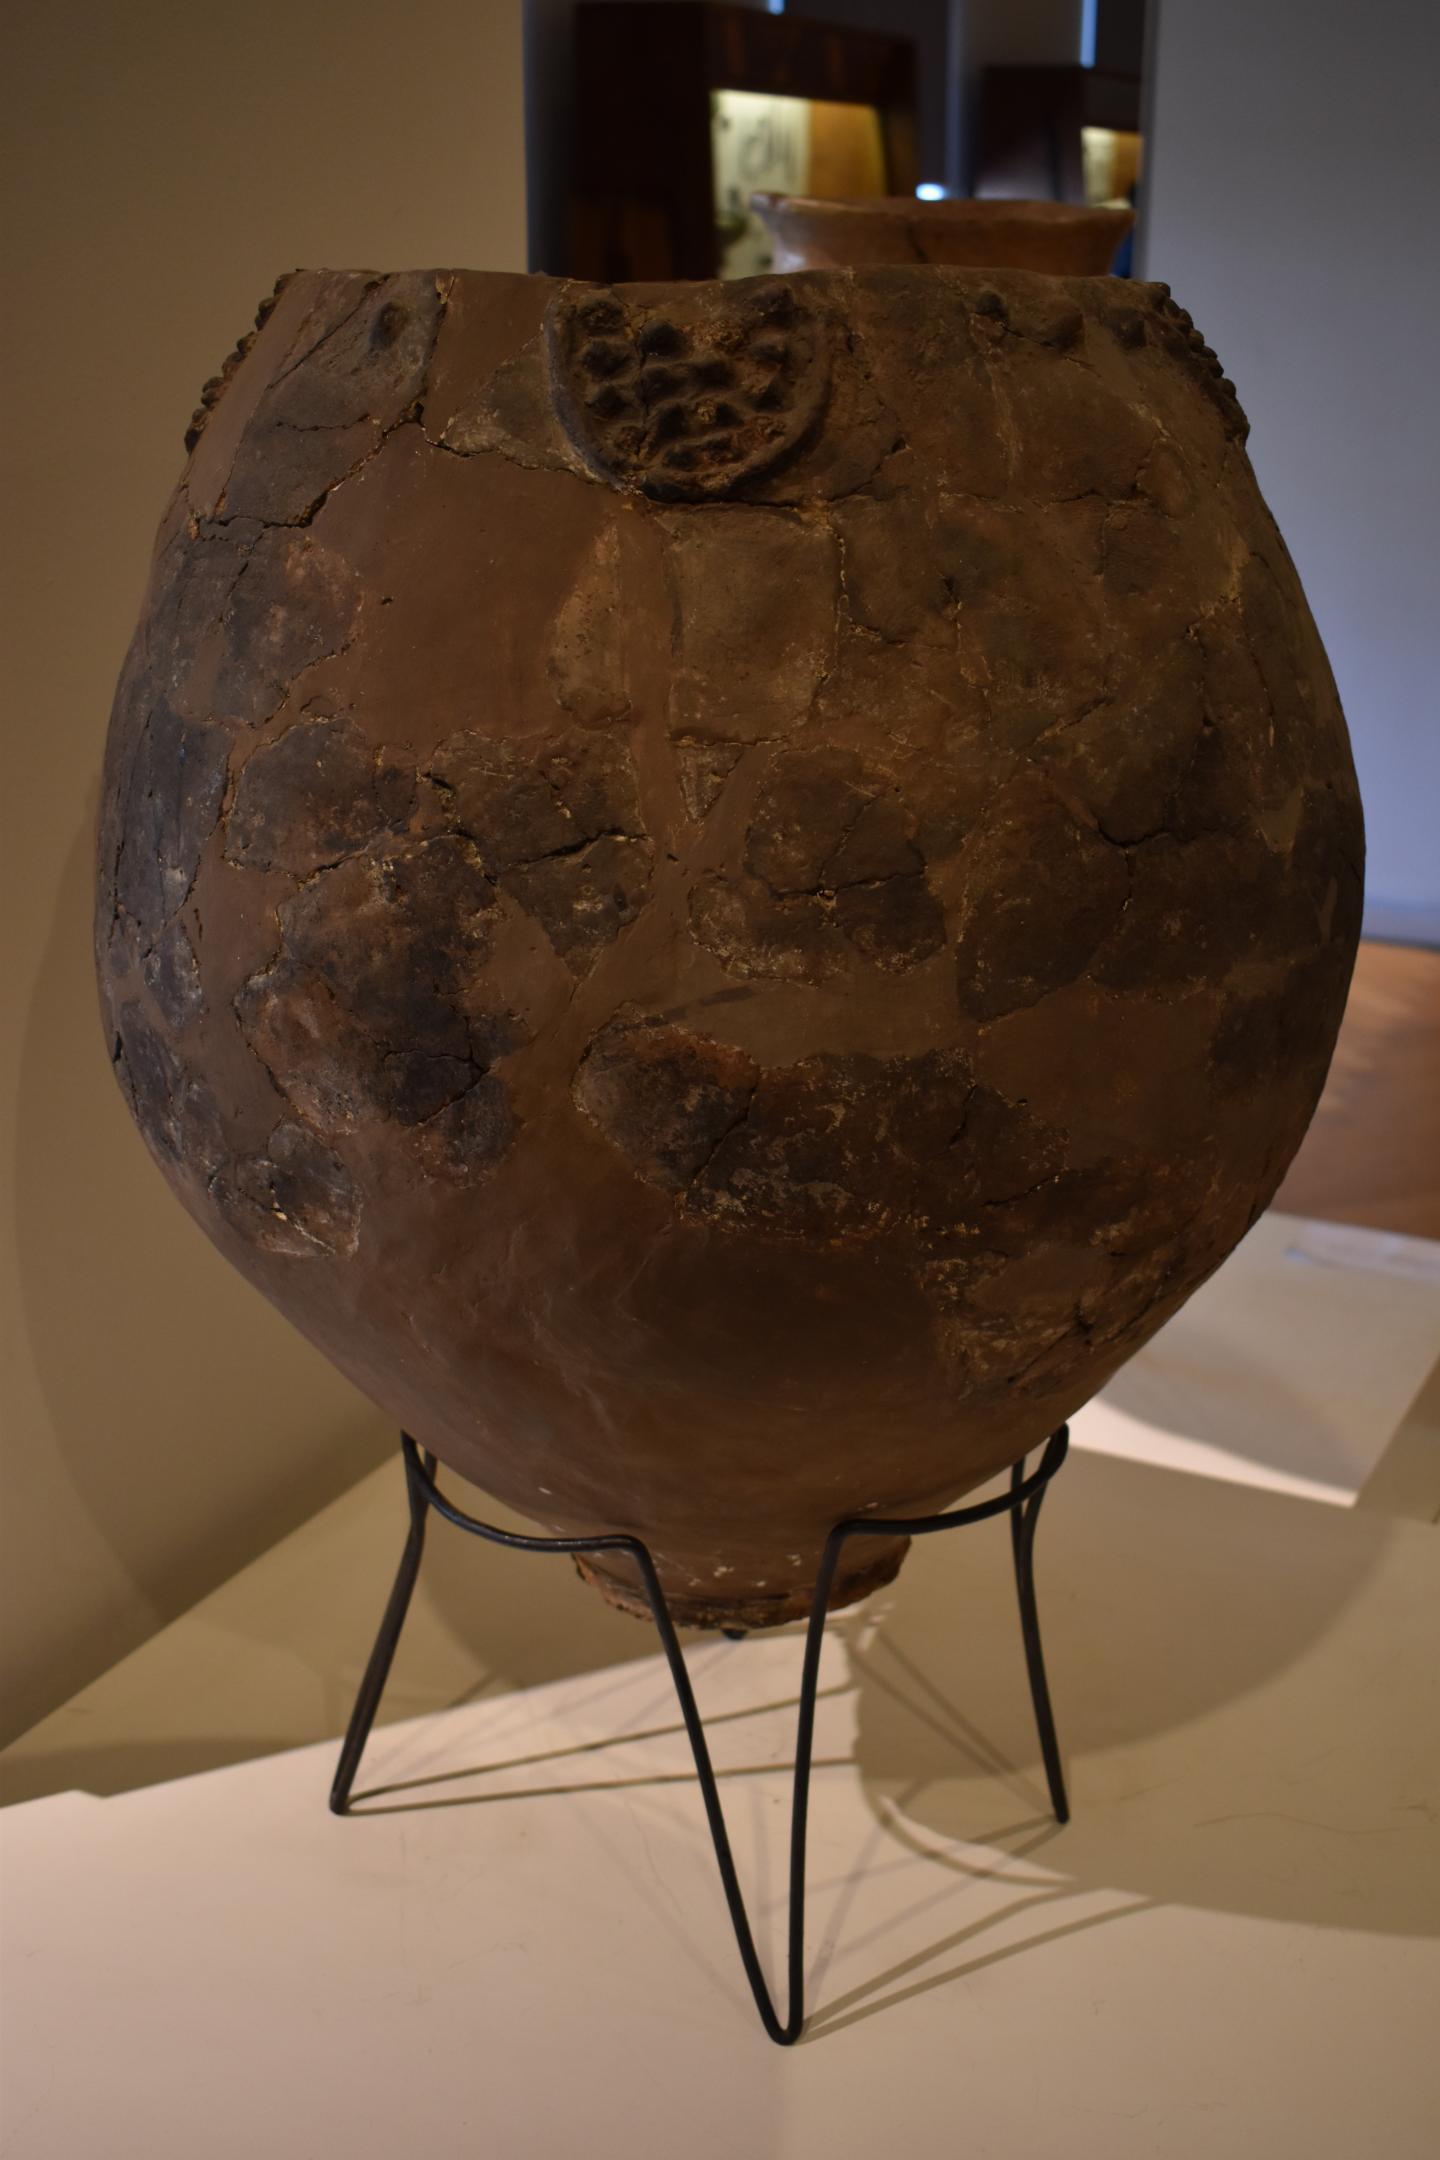 Neolithic Jar in Georgian National Museum